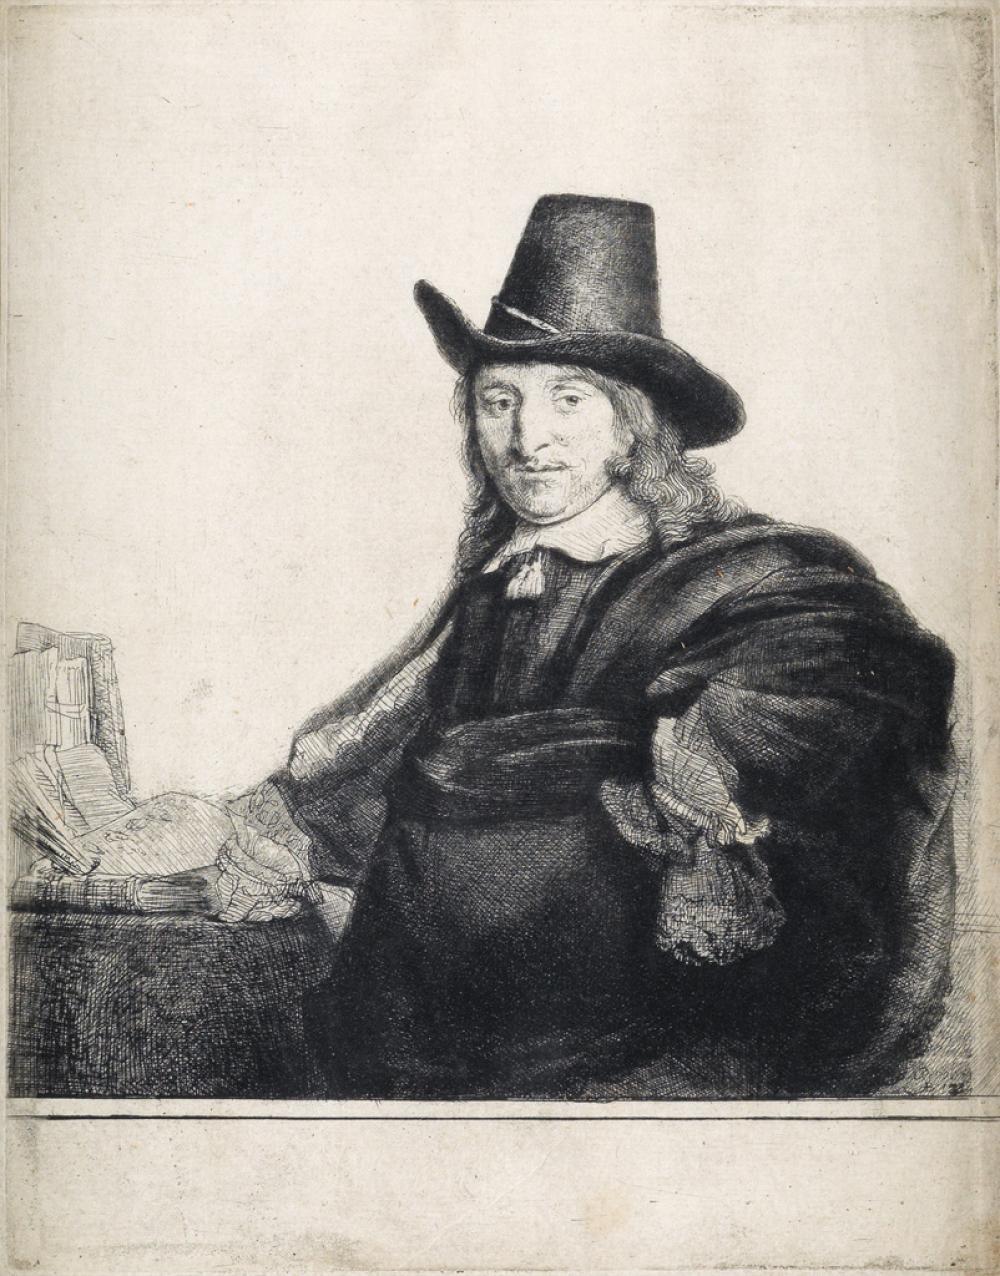 REMBRANDT VAN RIJN Jan Asselyn, Painter.